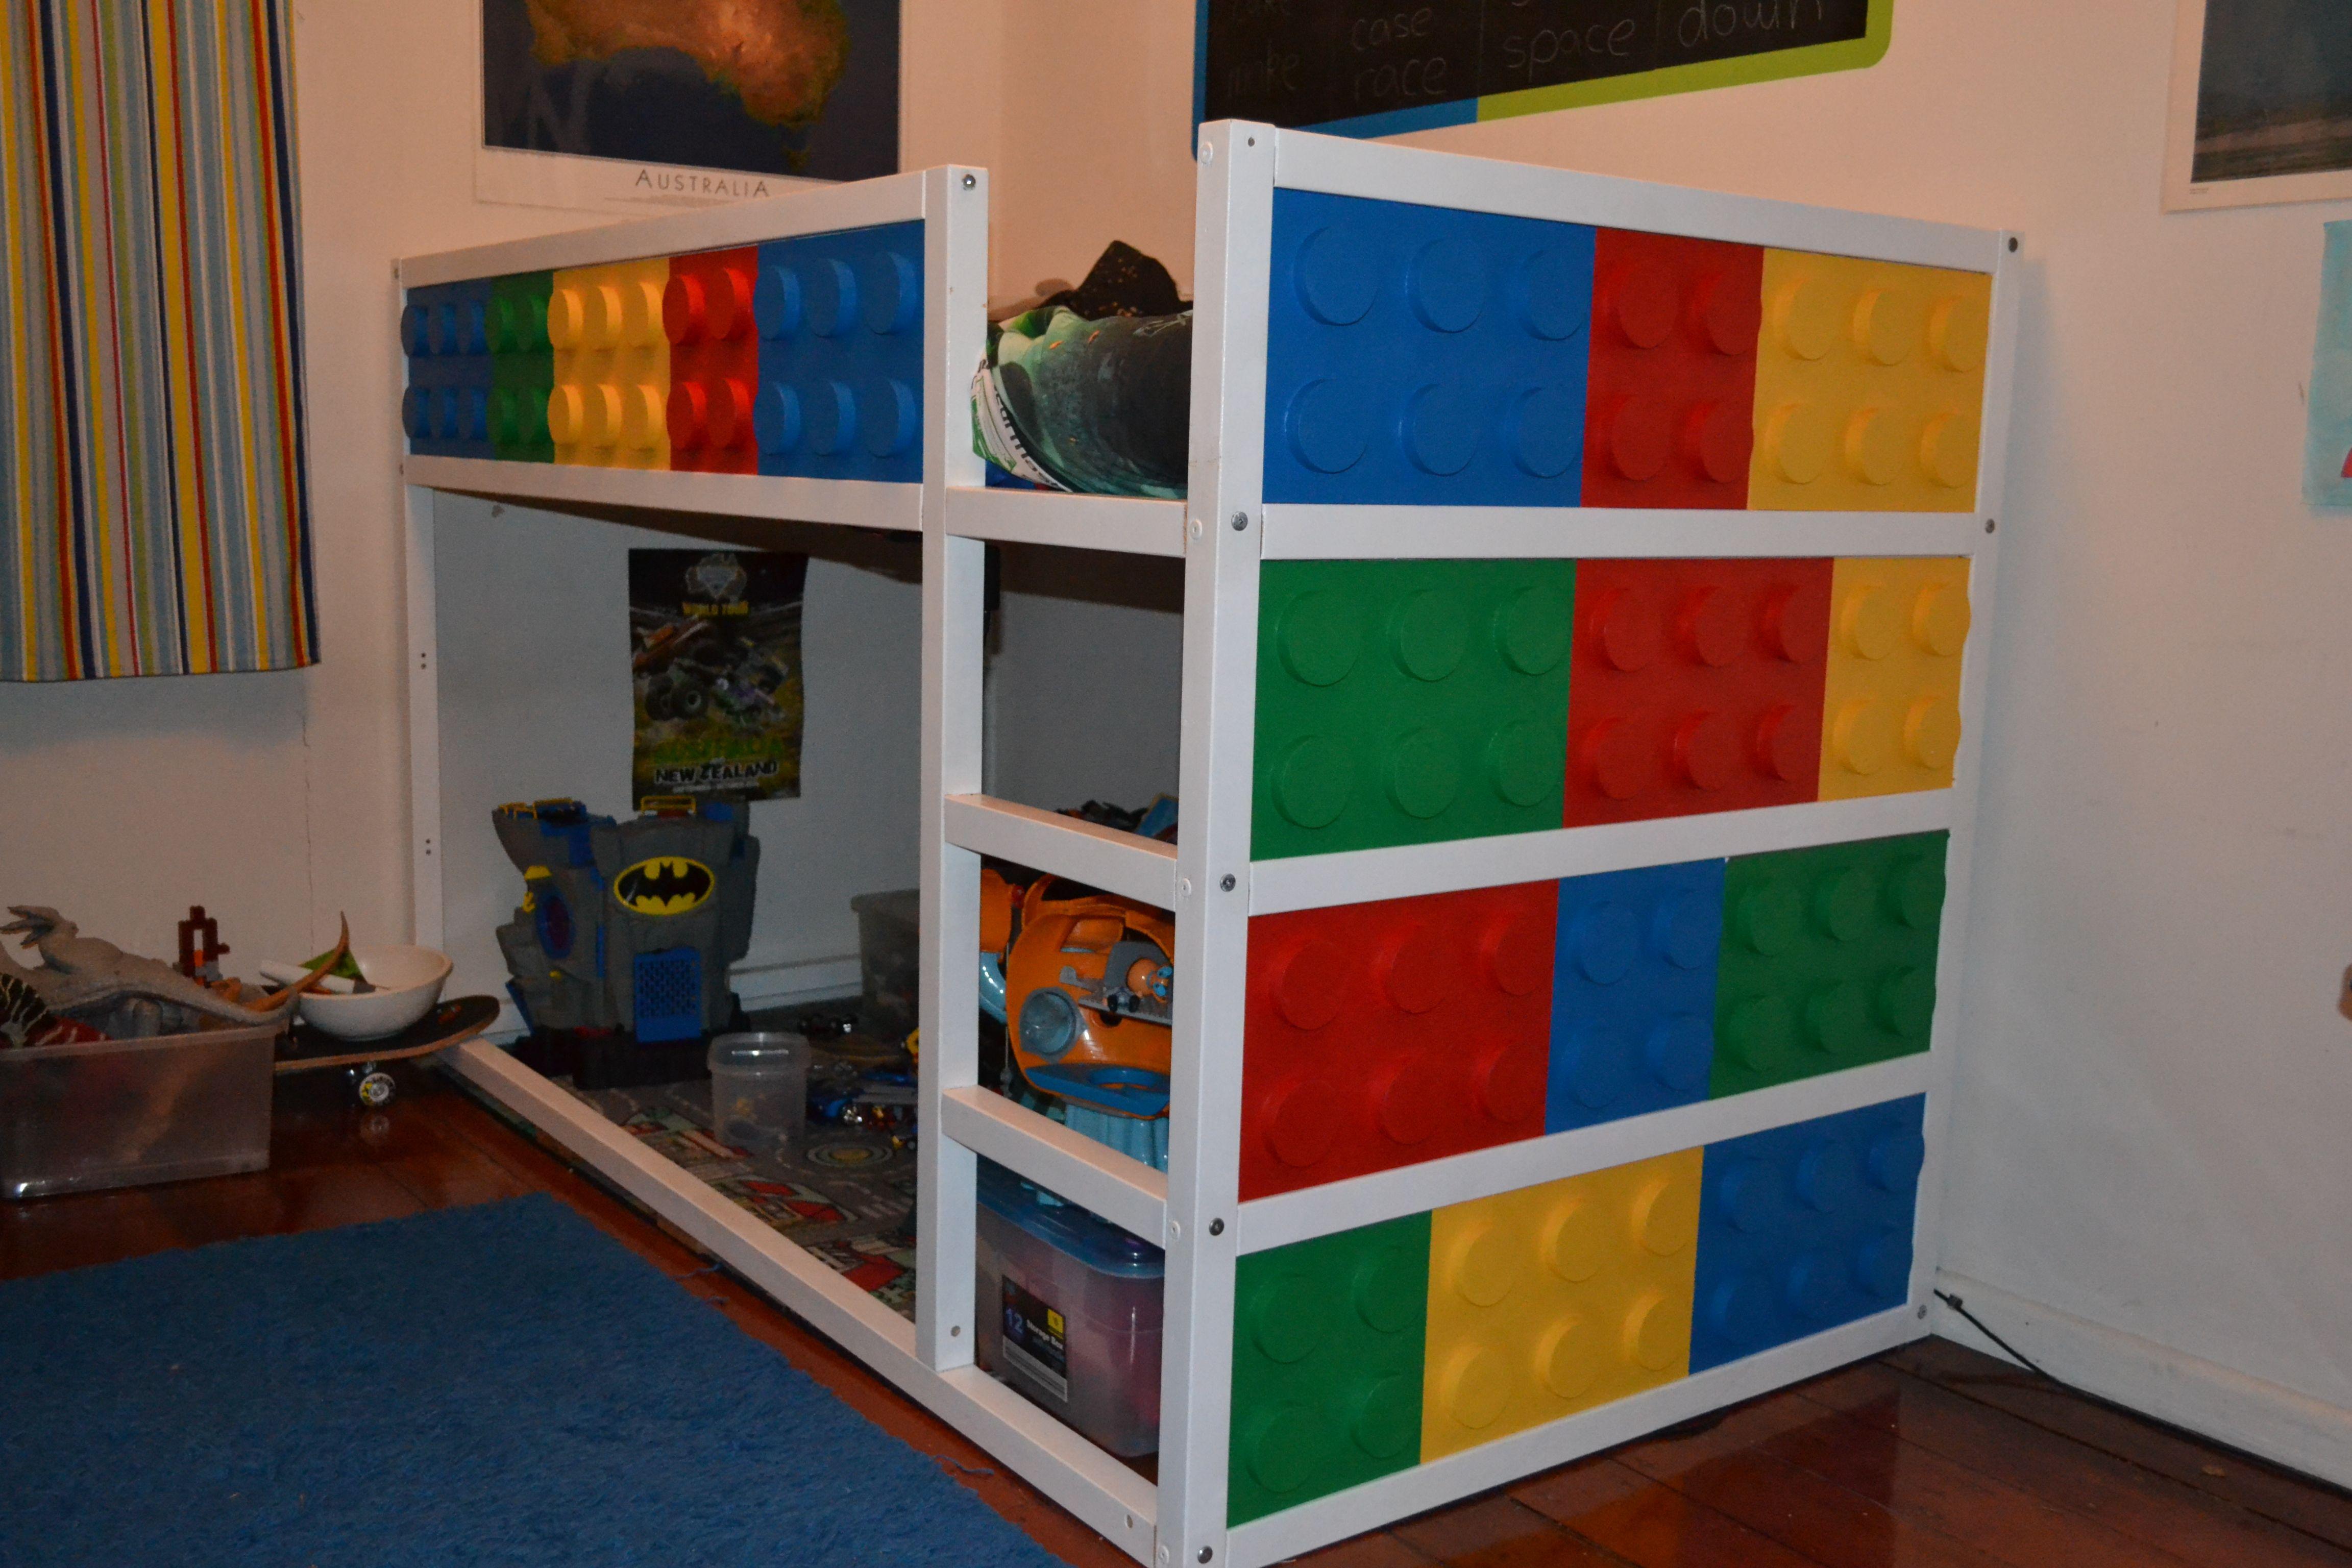 Ikea Kura Bed Hack Lego Bed For The Home Lego Bedroom Kura